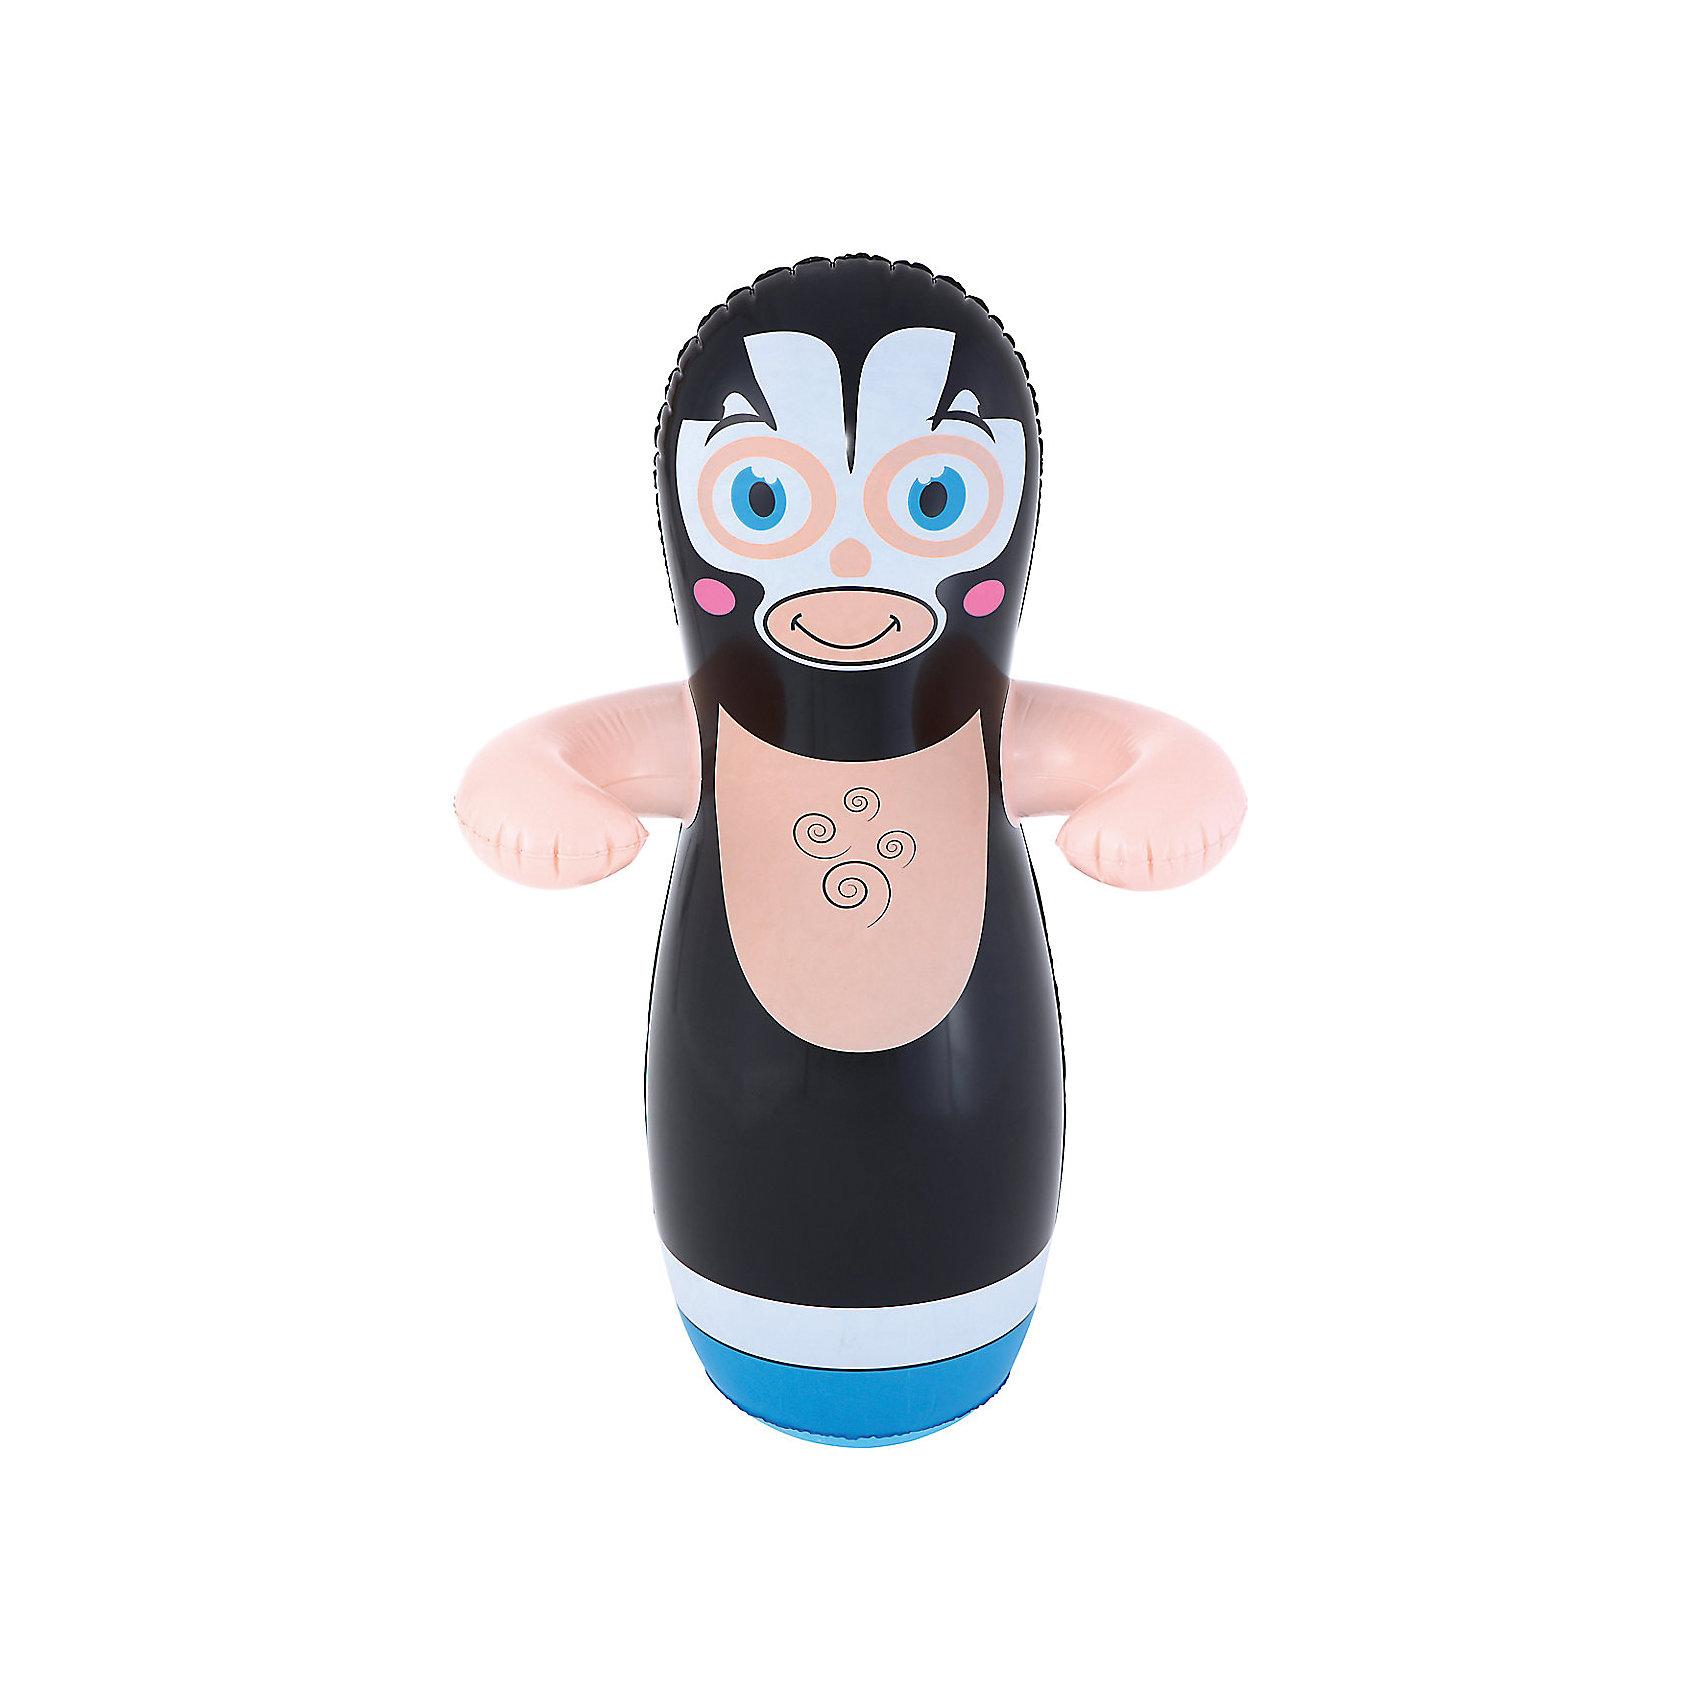 Груша боксерская, 91 см, Bestway, черная от myToys